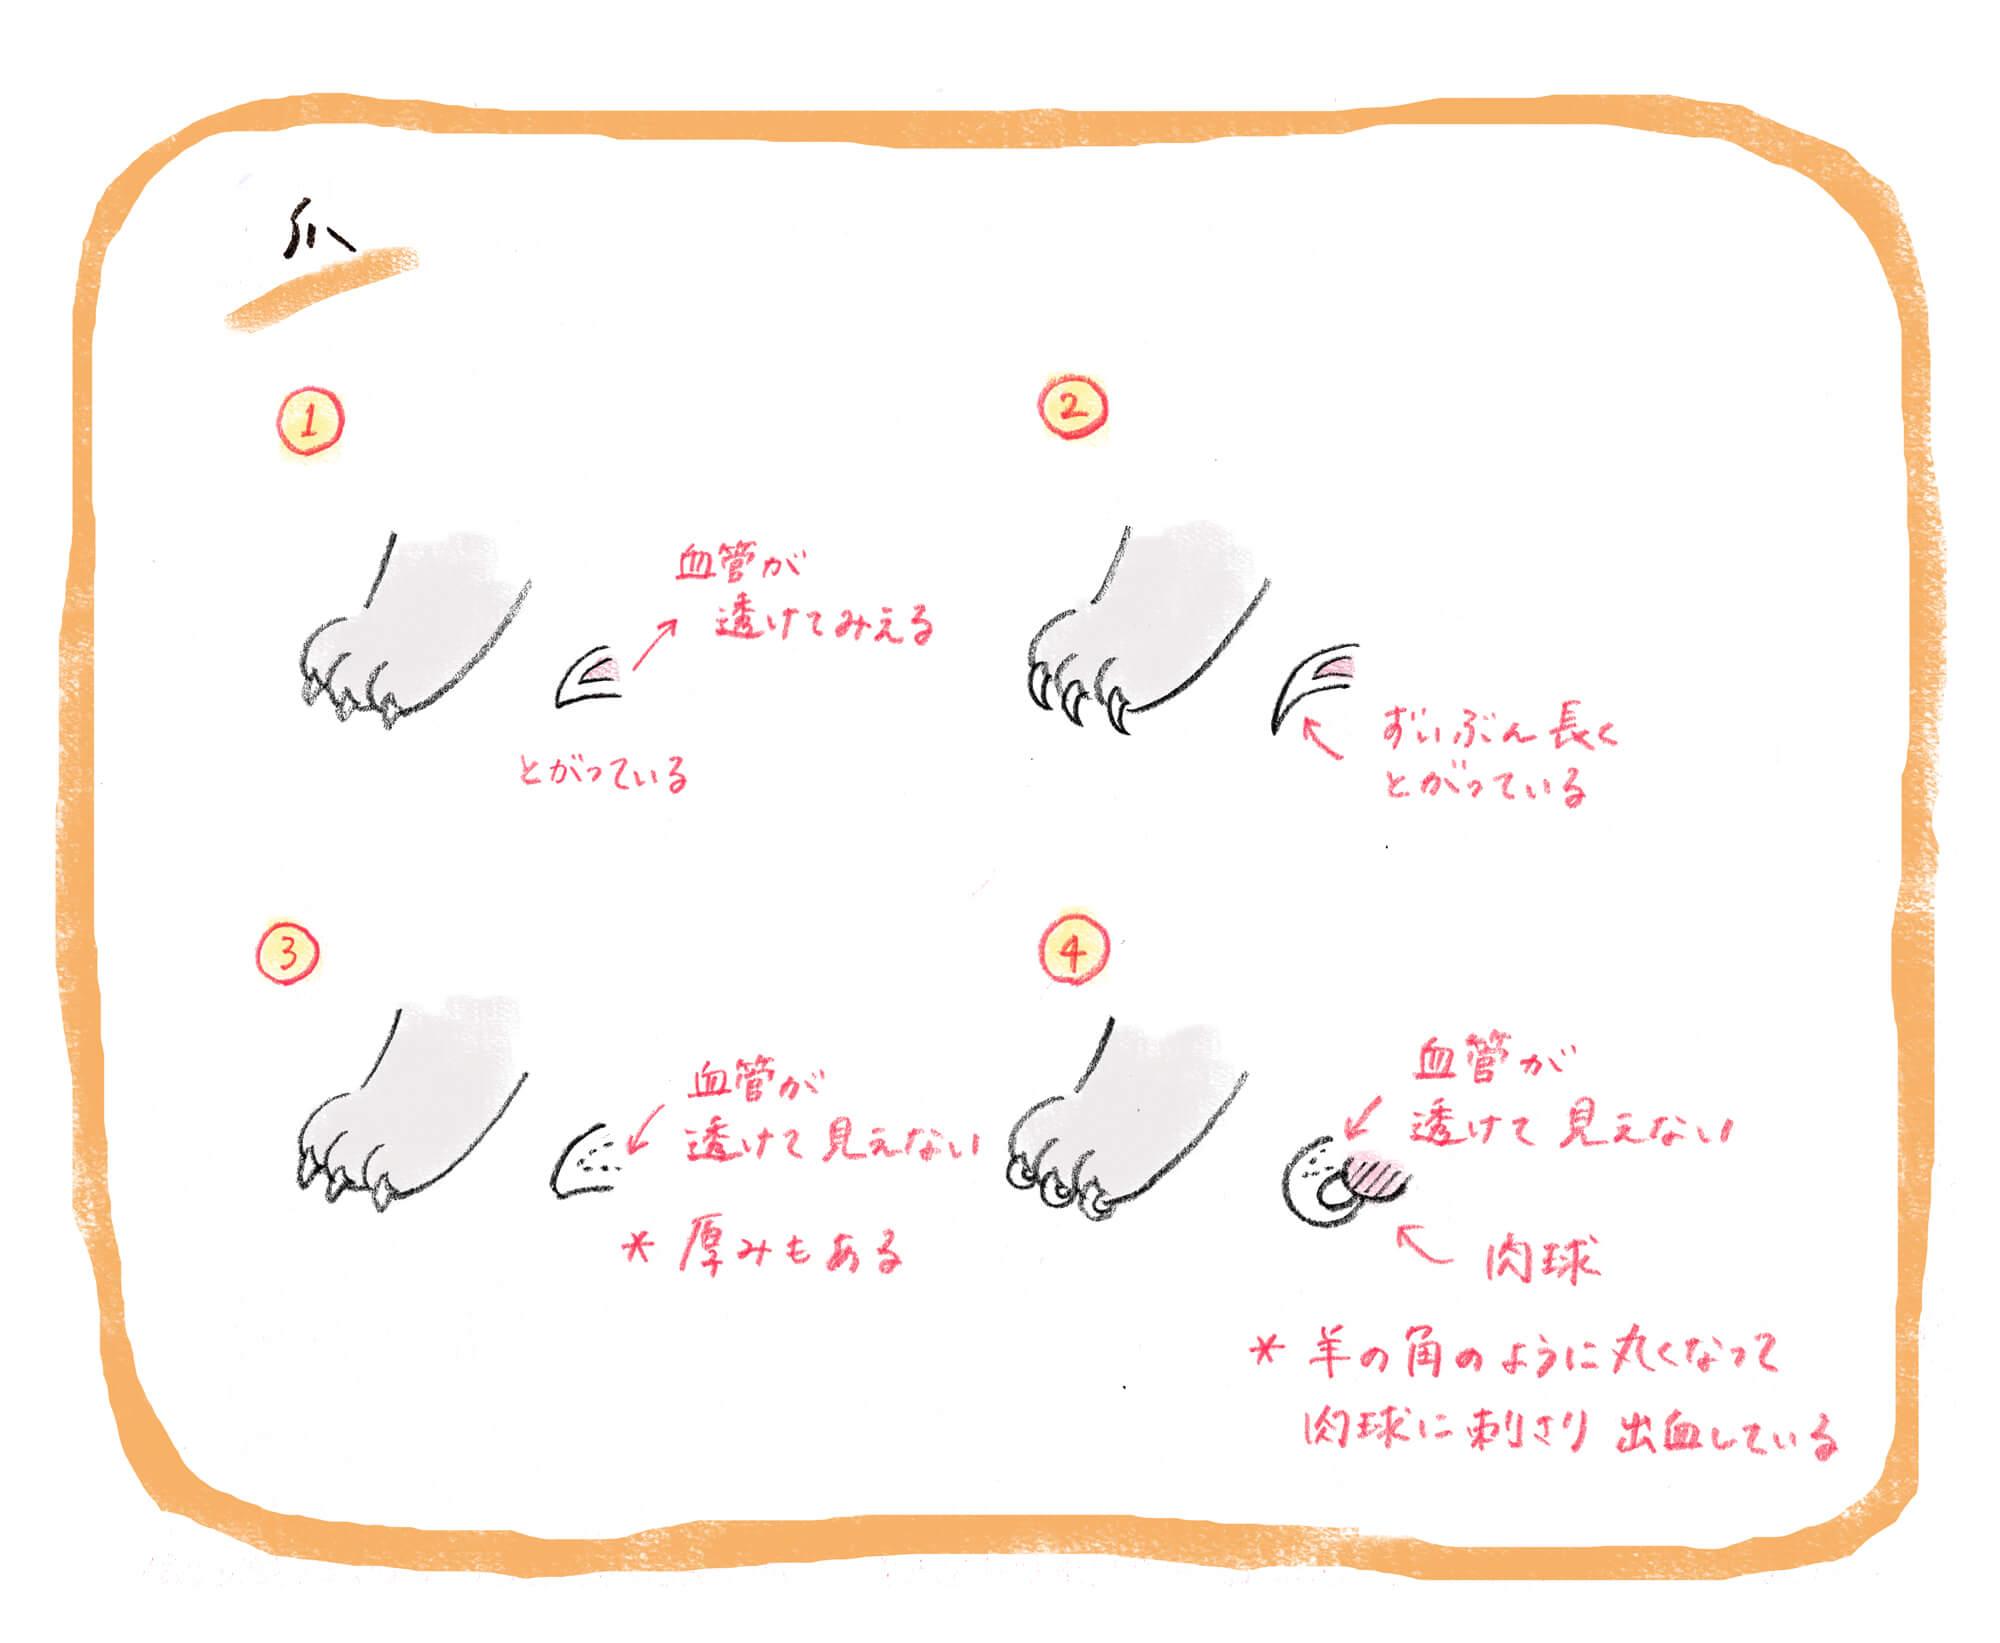 fanimal_0121_爪 | Fanimal(ファニマル)